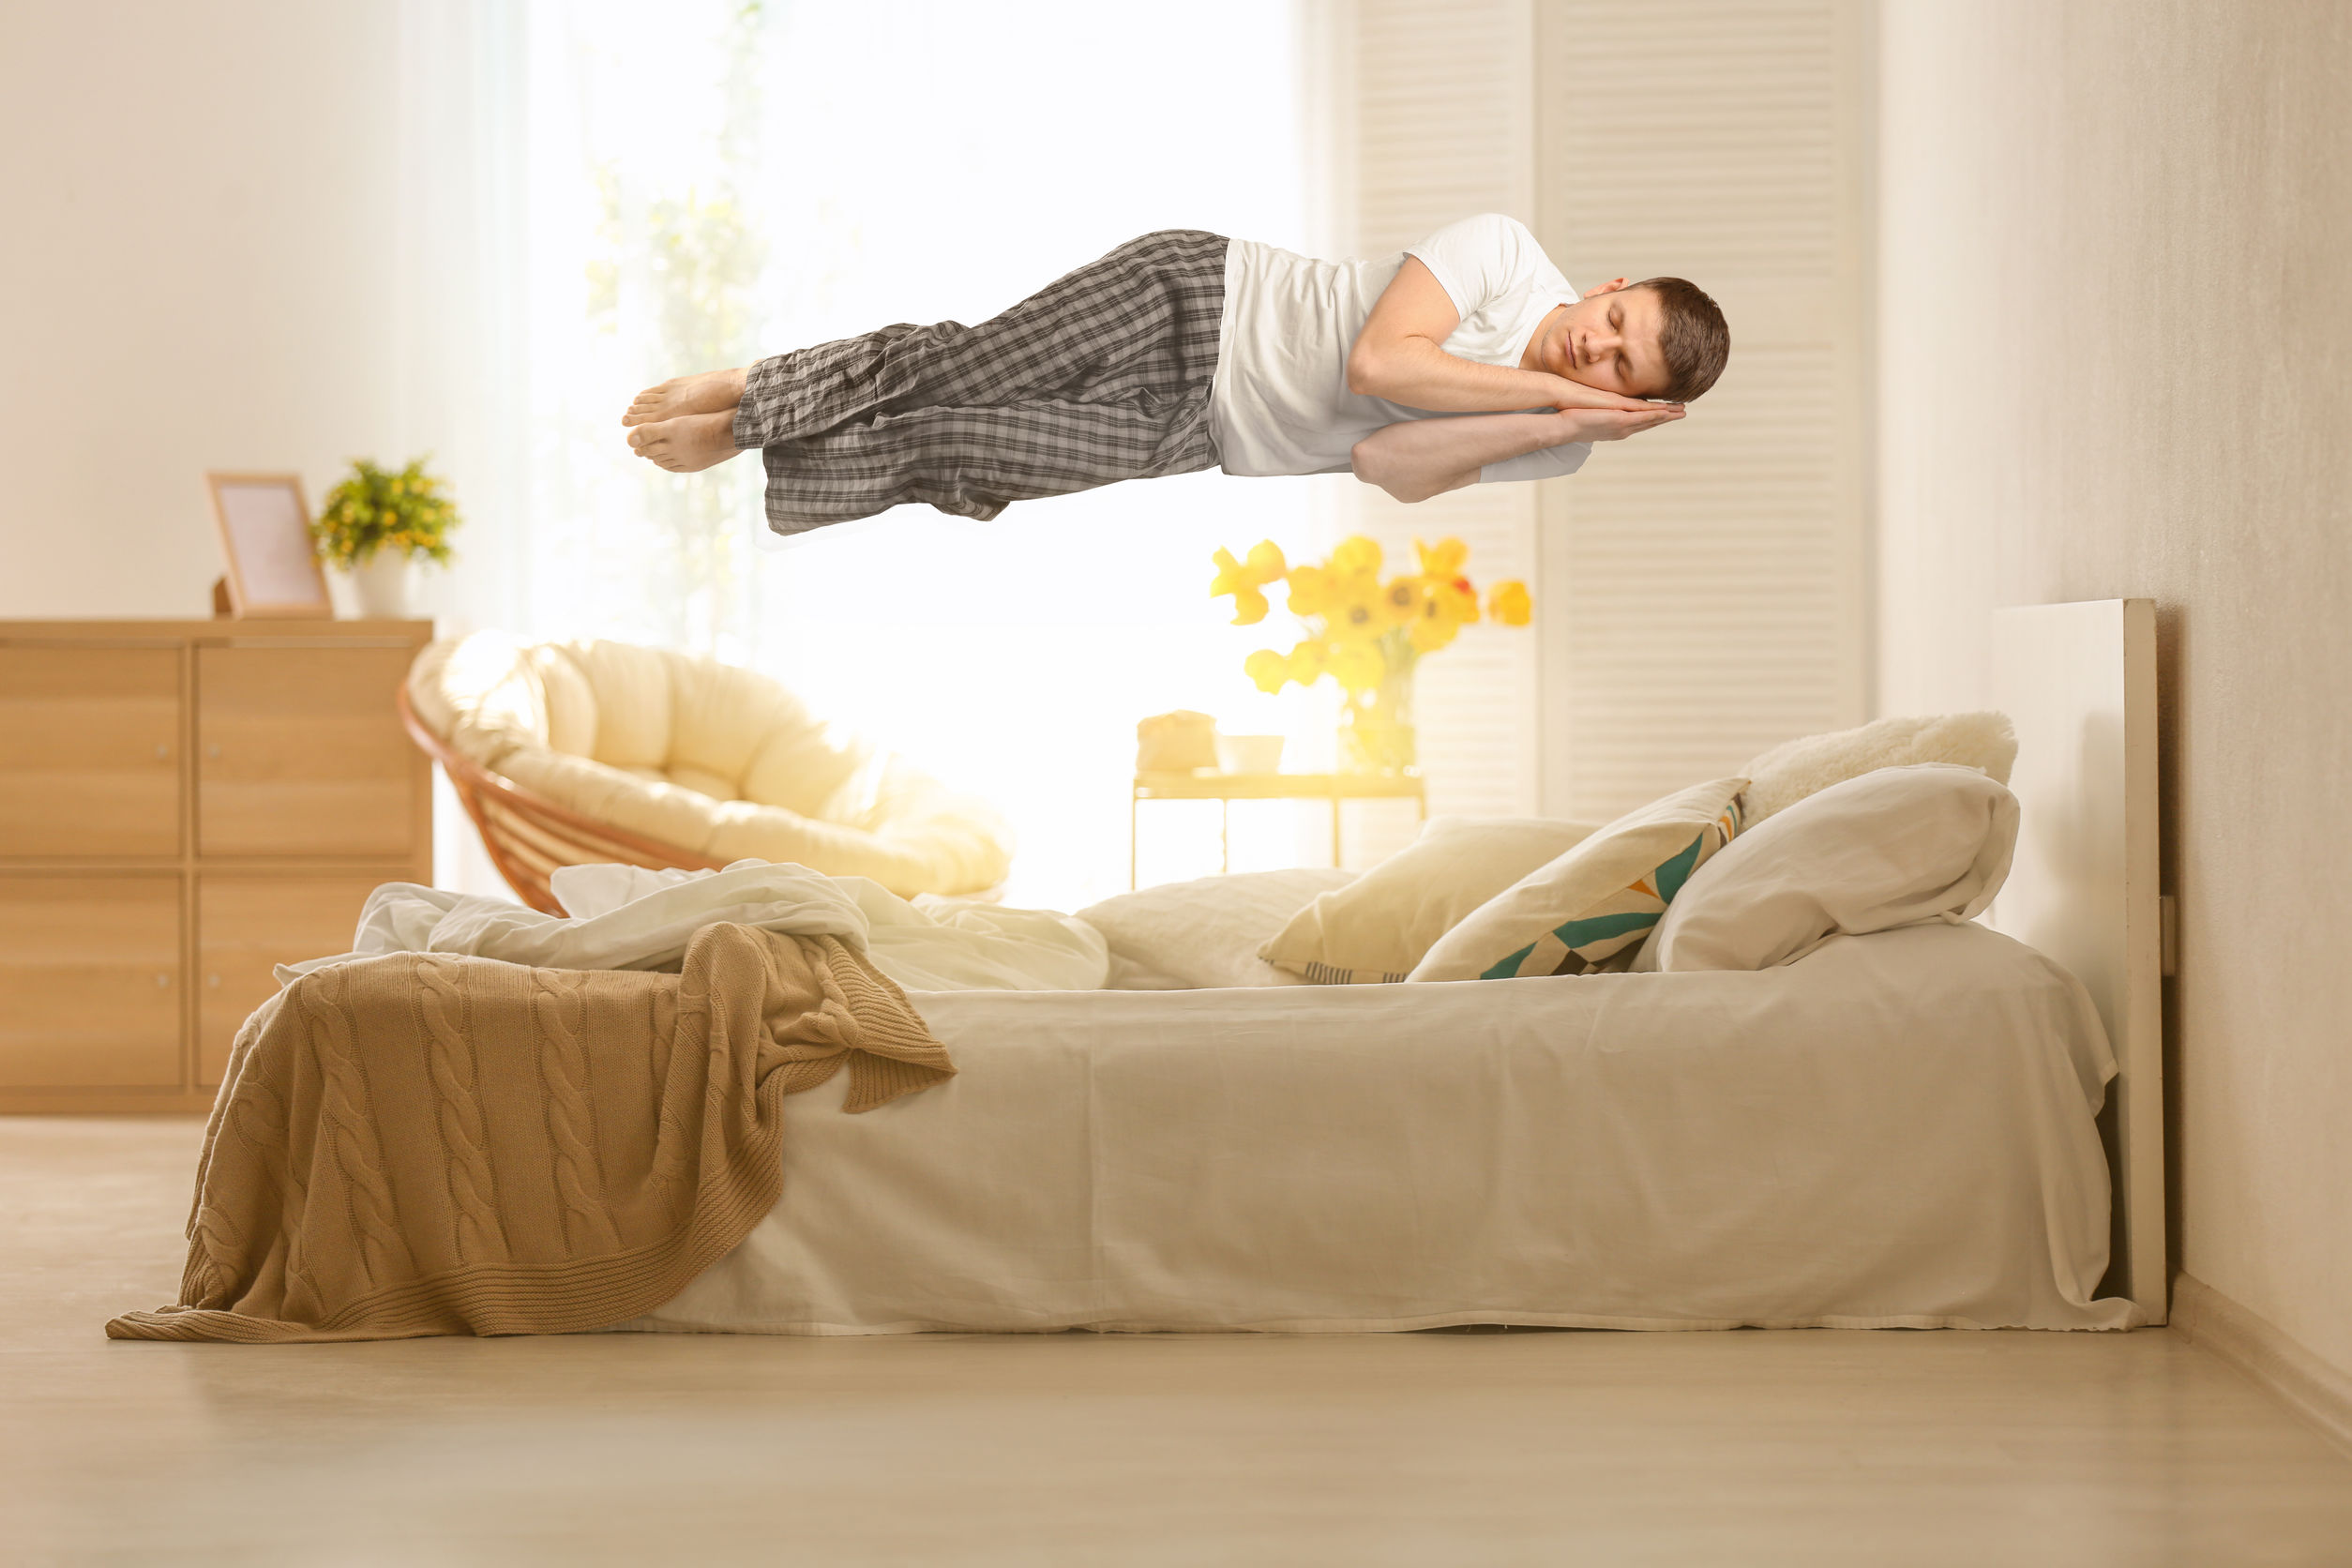 Mediation and levitation